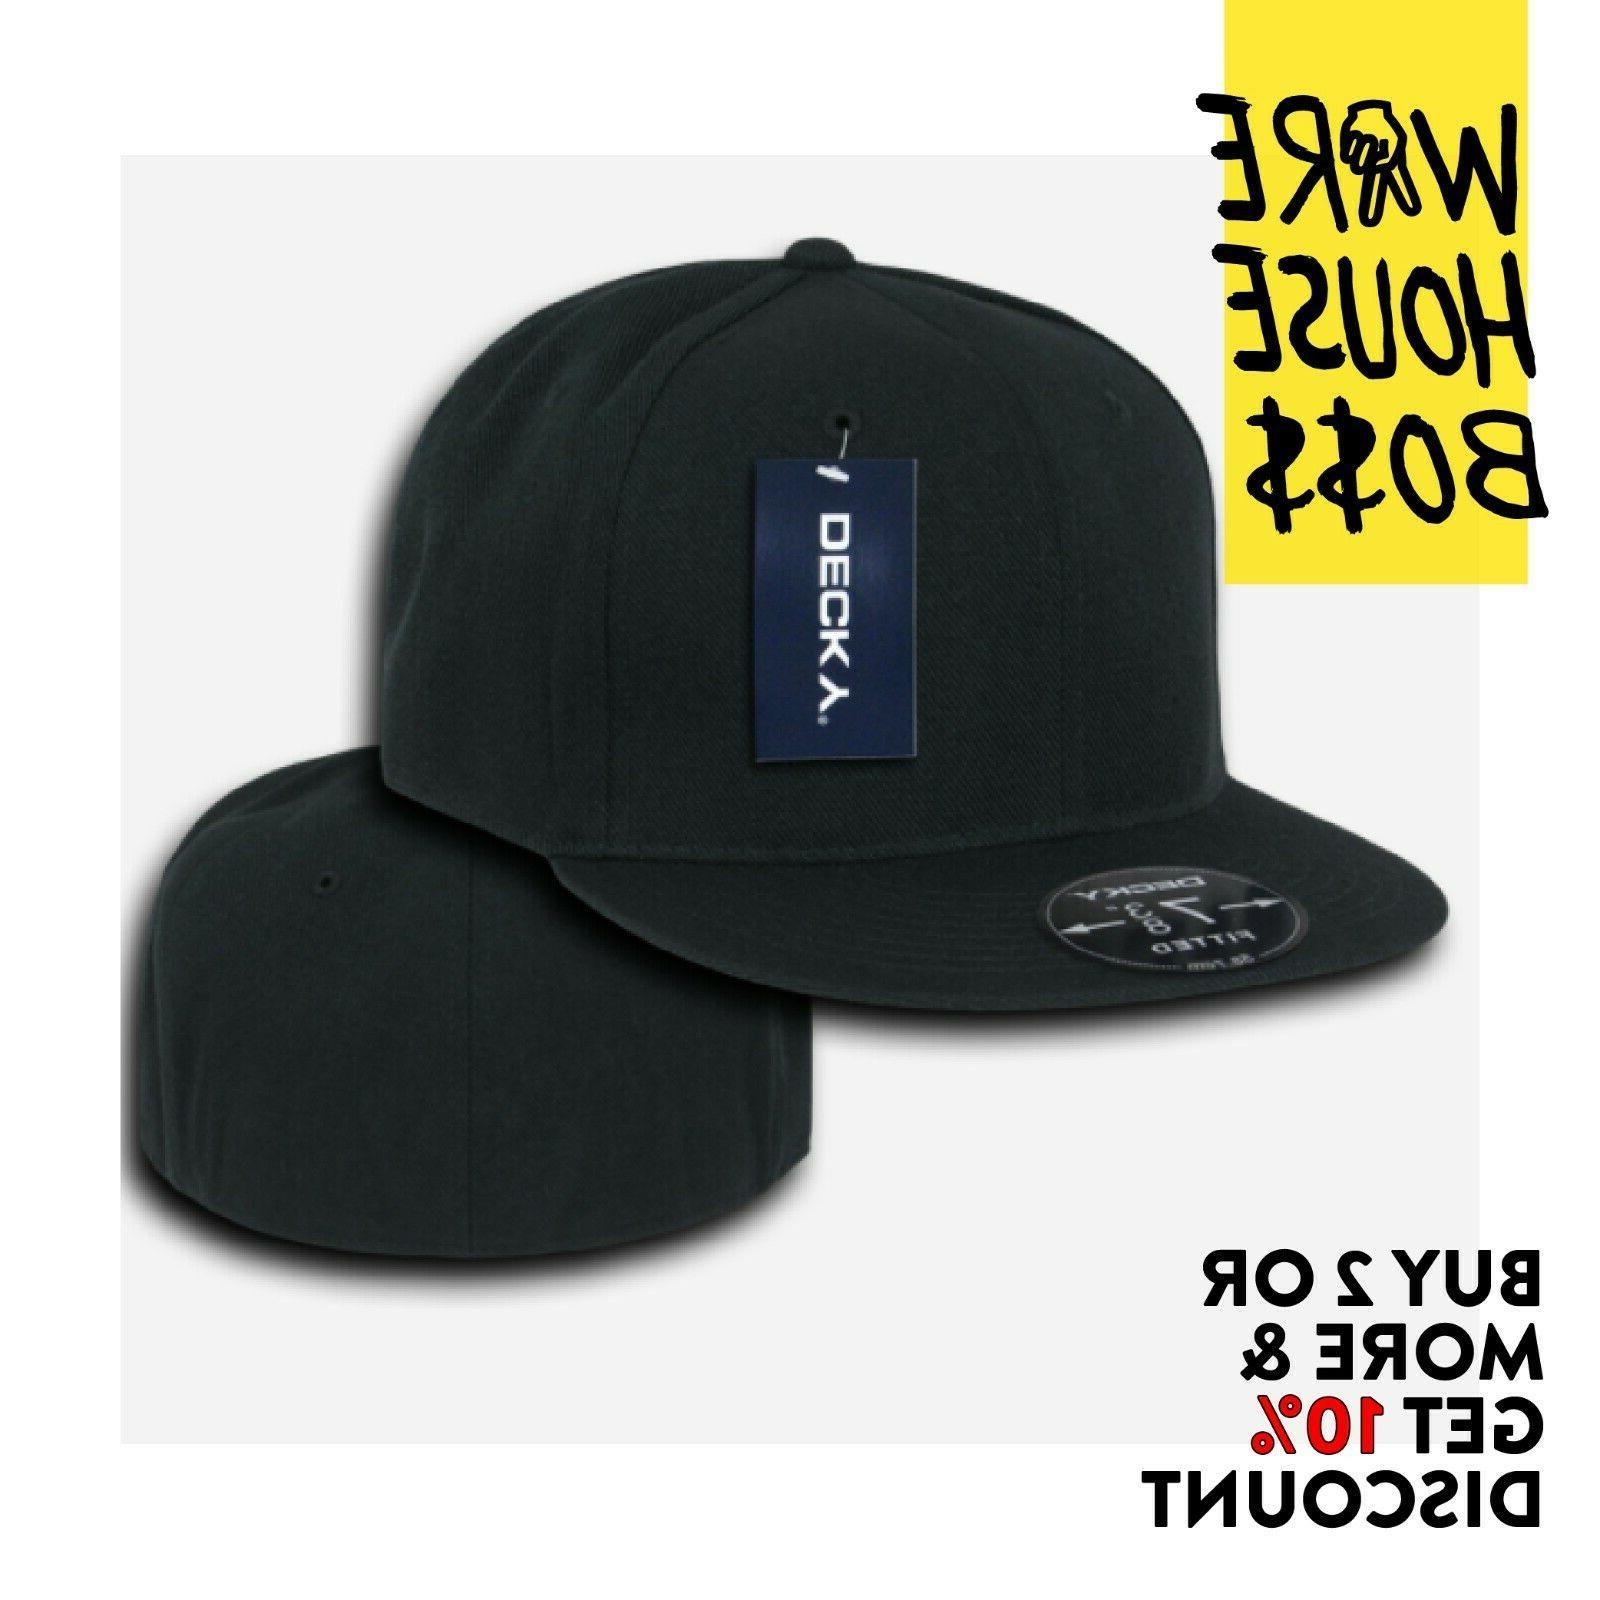 HATS BASIC